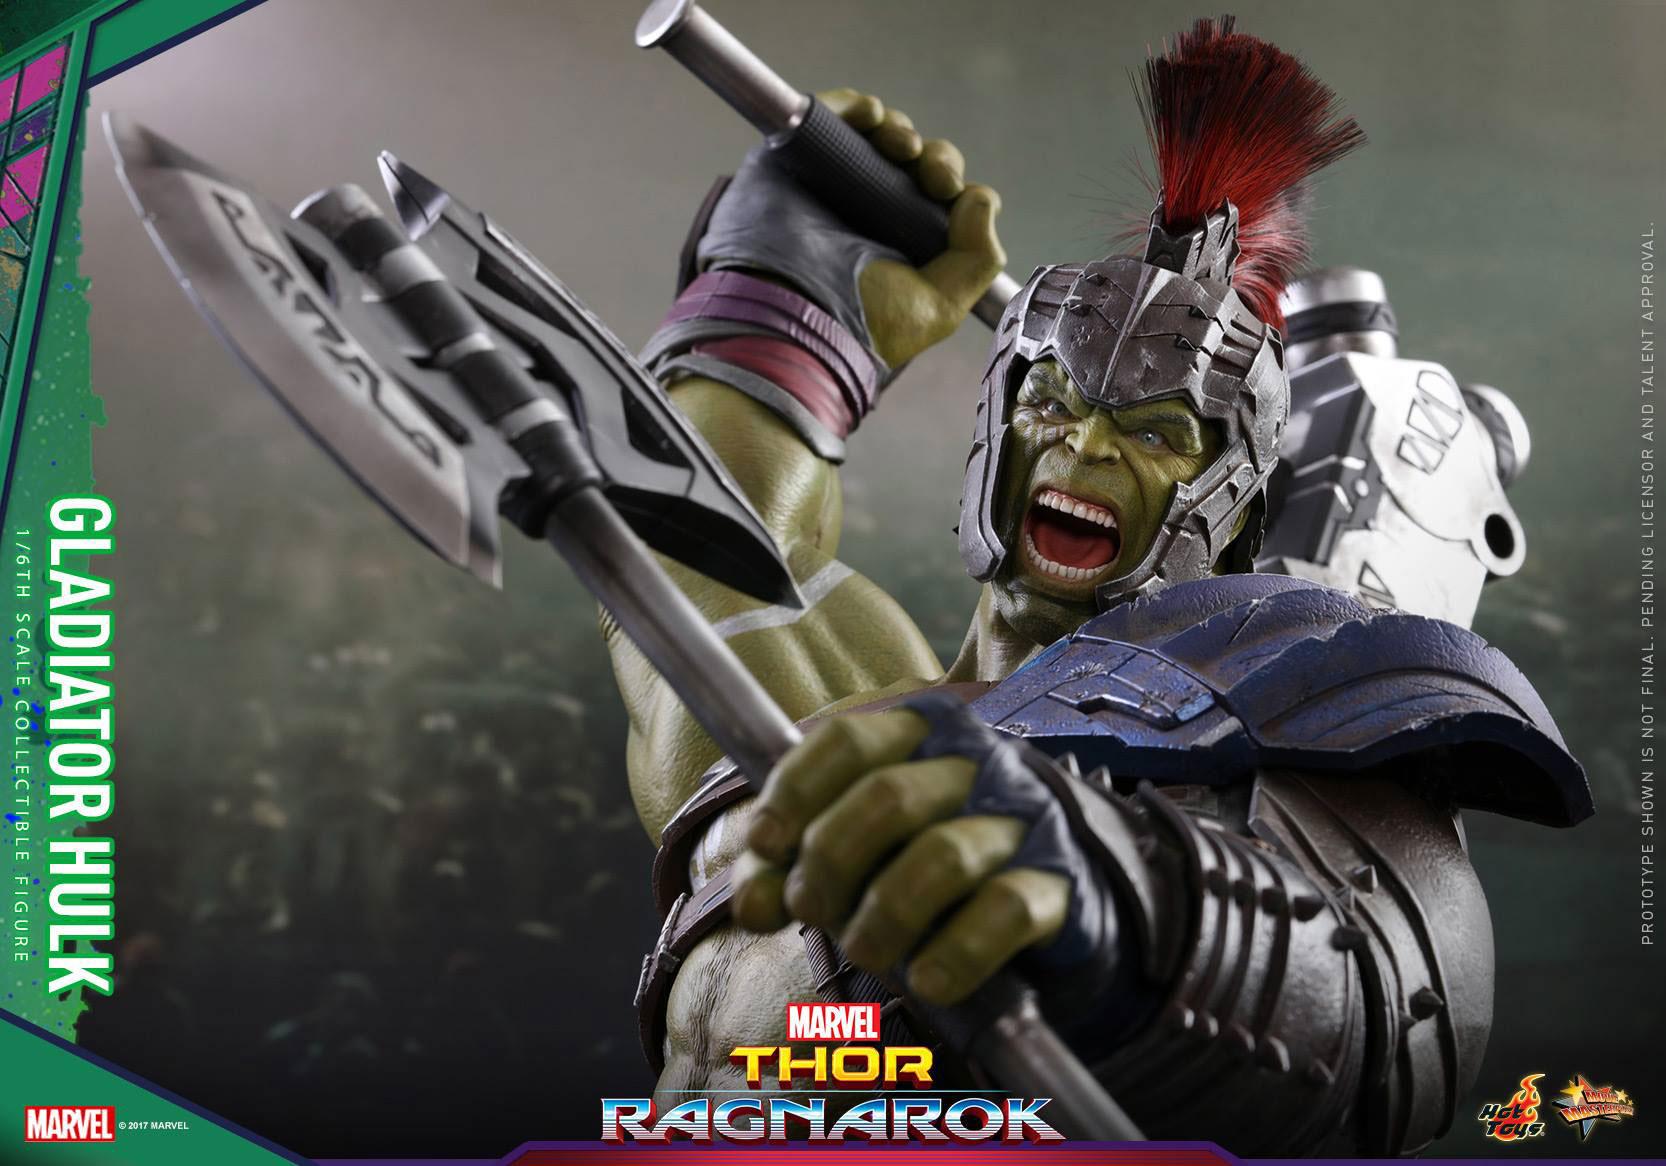 thor-ragnarok-gladiator-hulk-hot-toys-figure-5